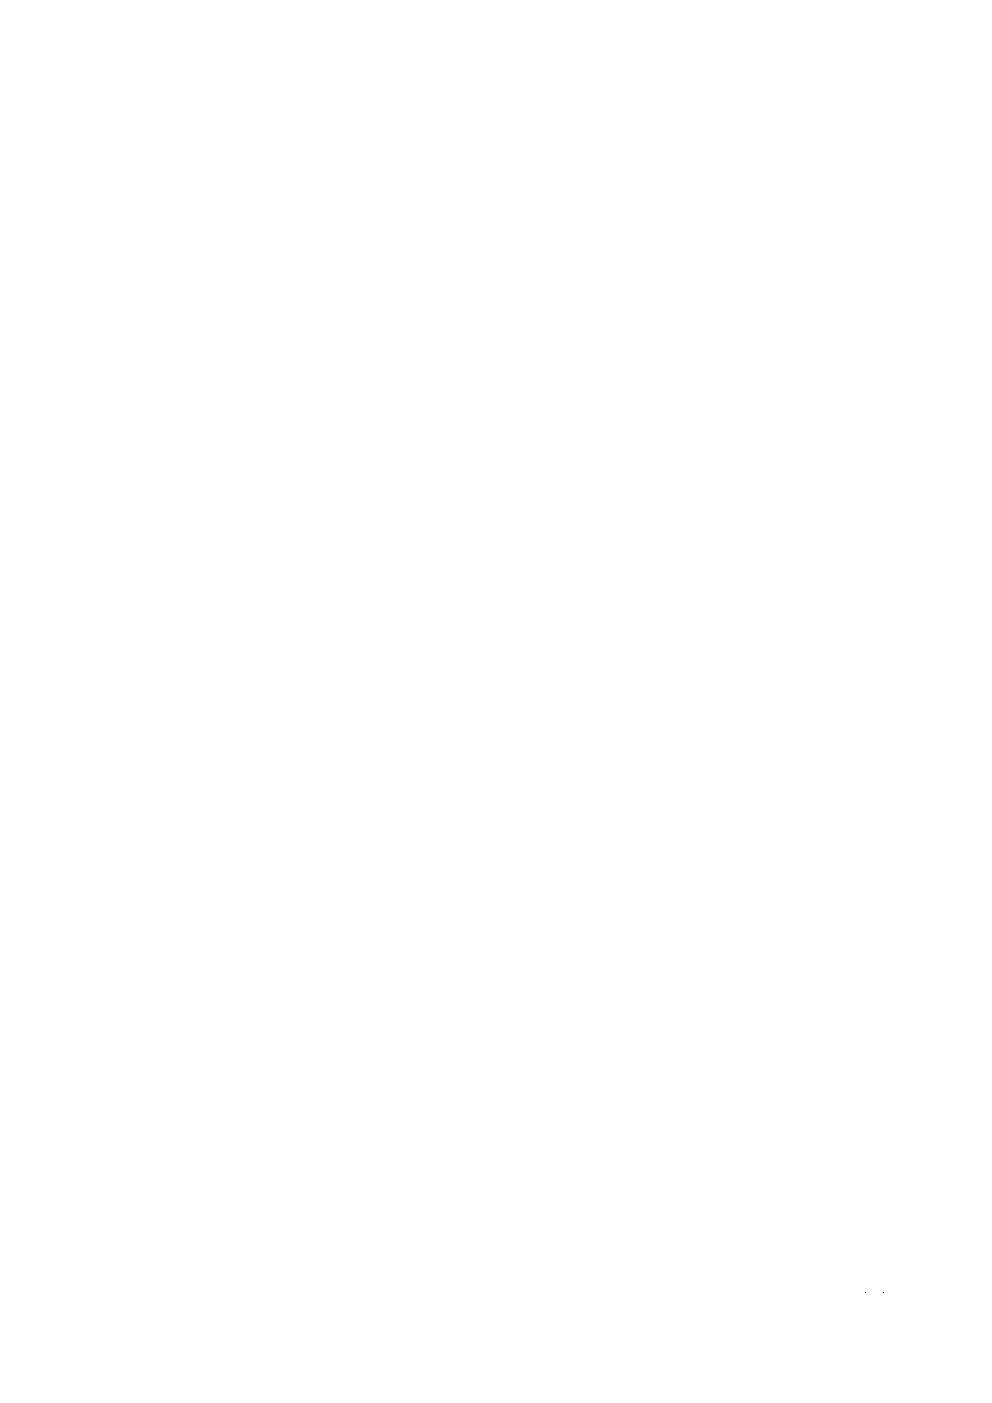 Satellite Communication By Dharma Raj Cheruku Pdf Download 7493 Datasheet My